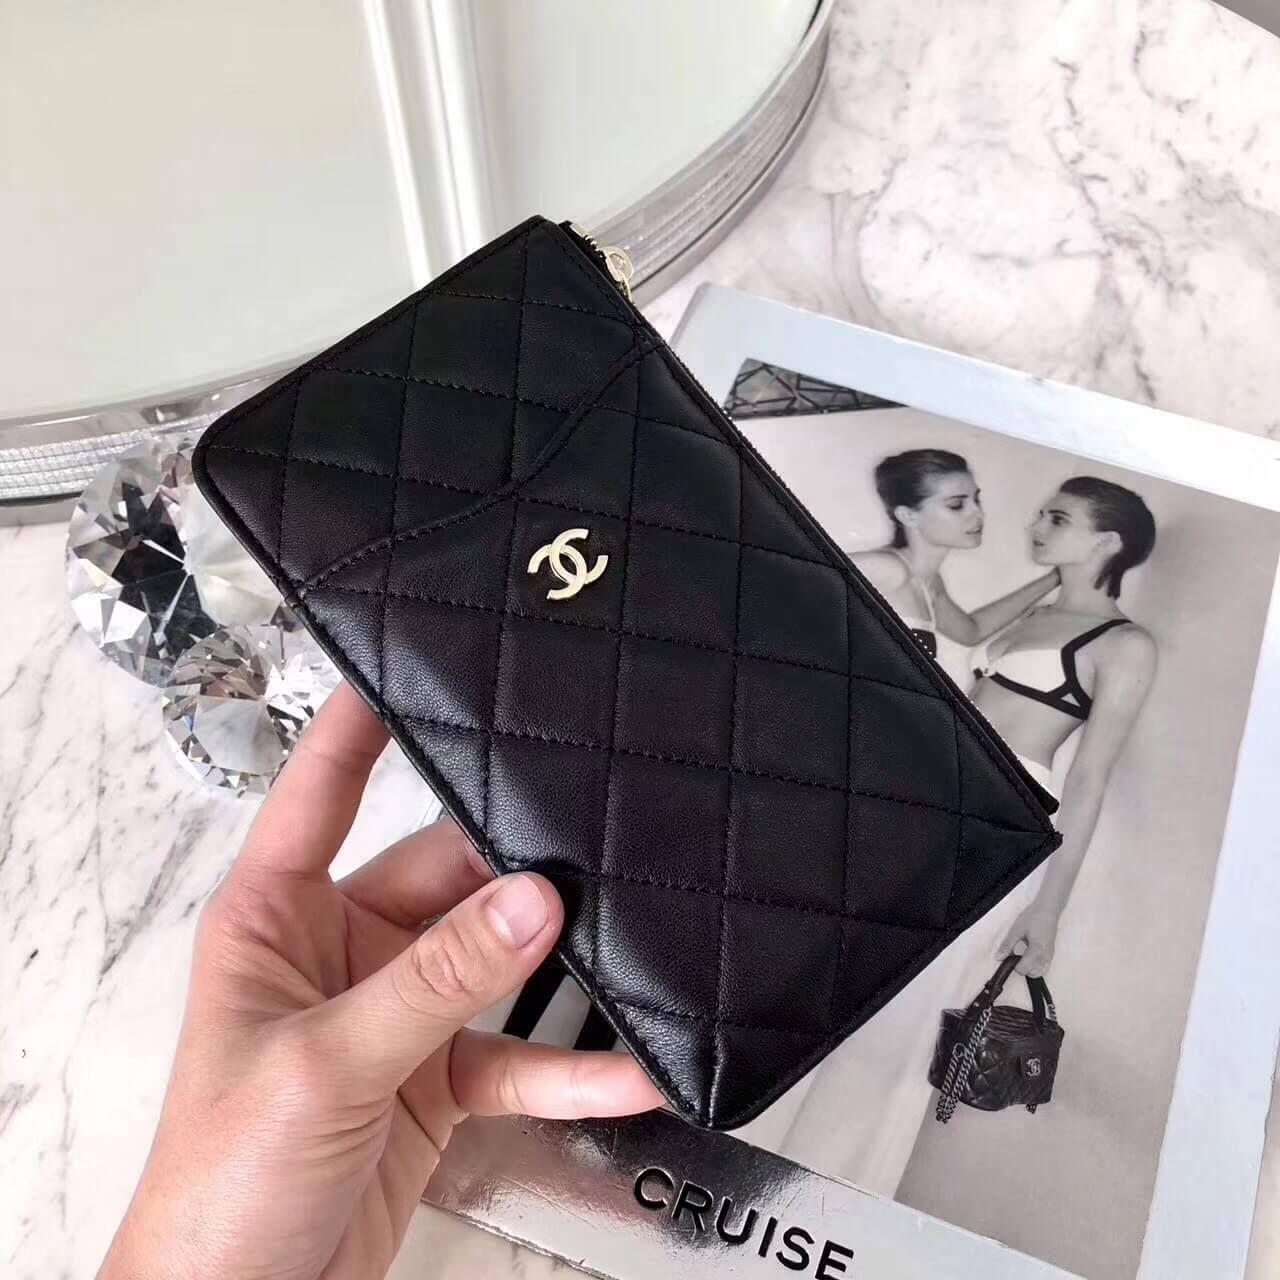 c514ced6e87ff6 Chanel Black Calfskin Classic Flat Wallet Pouch Phone Holder A84402 2018